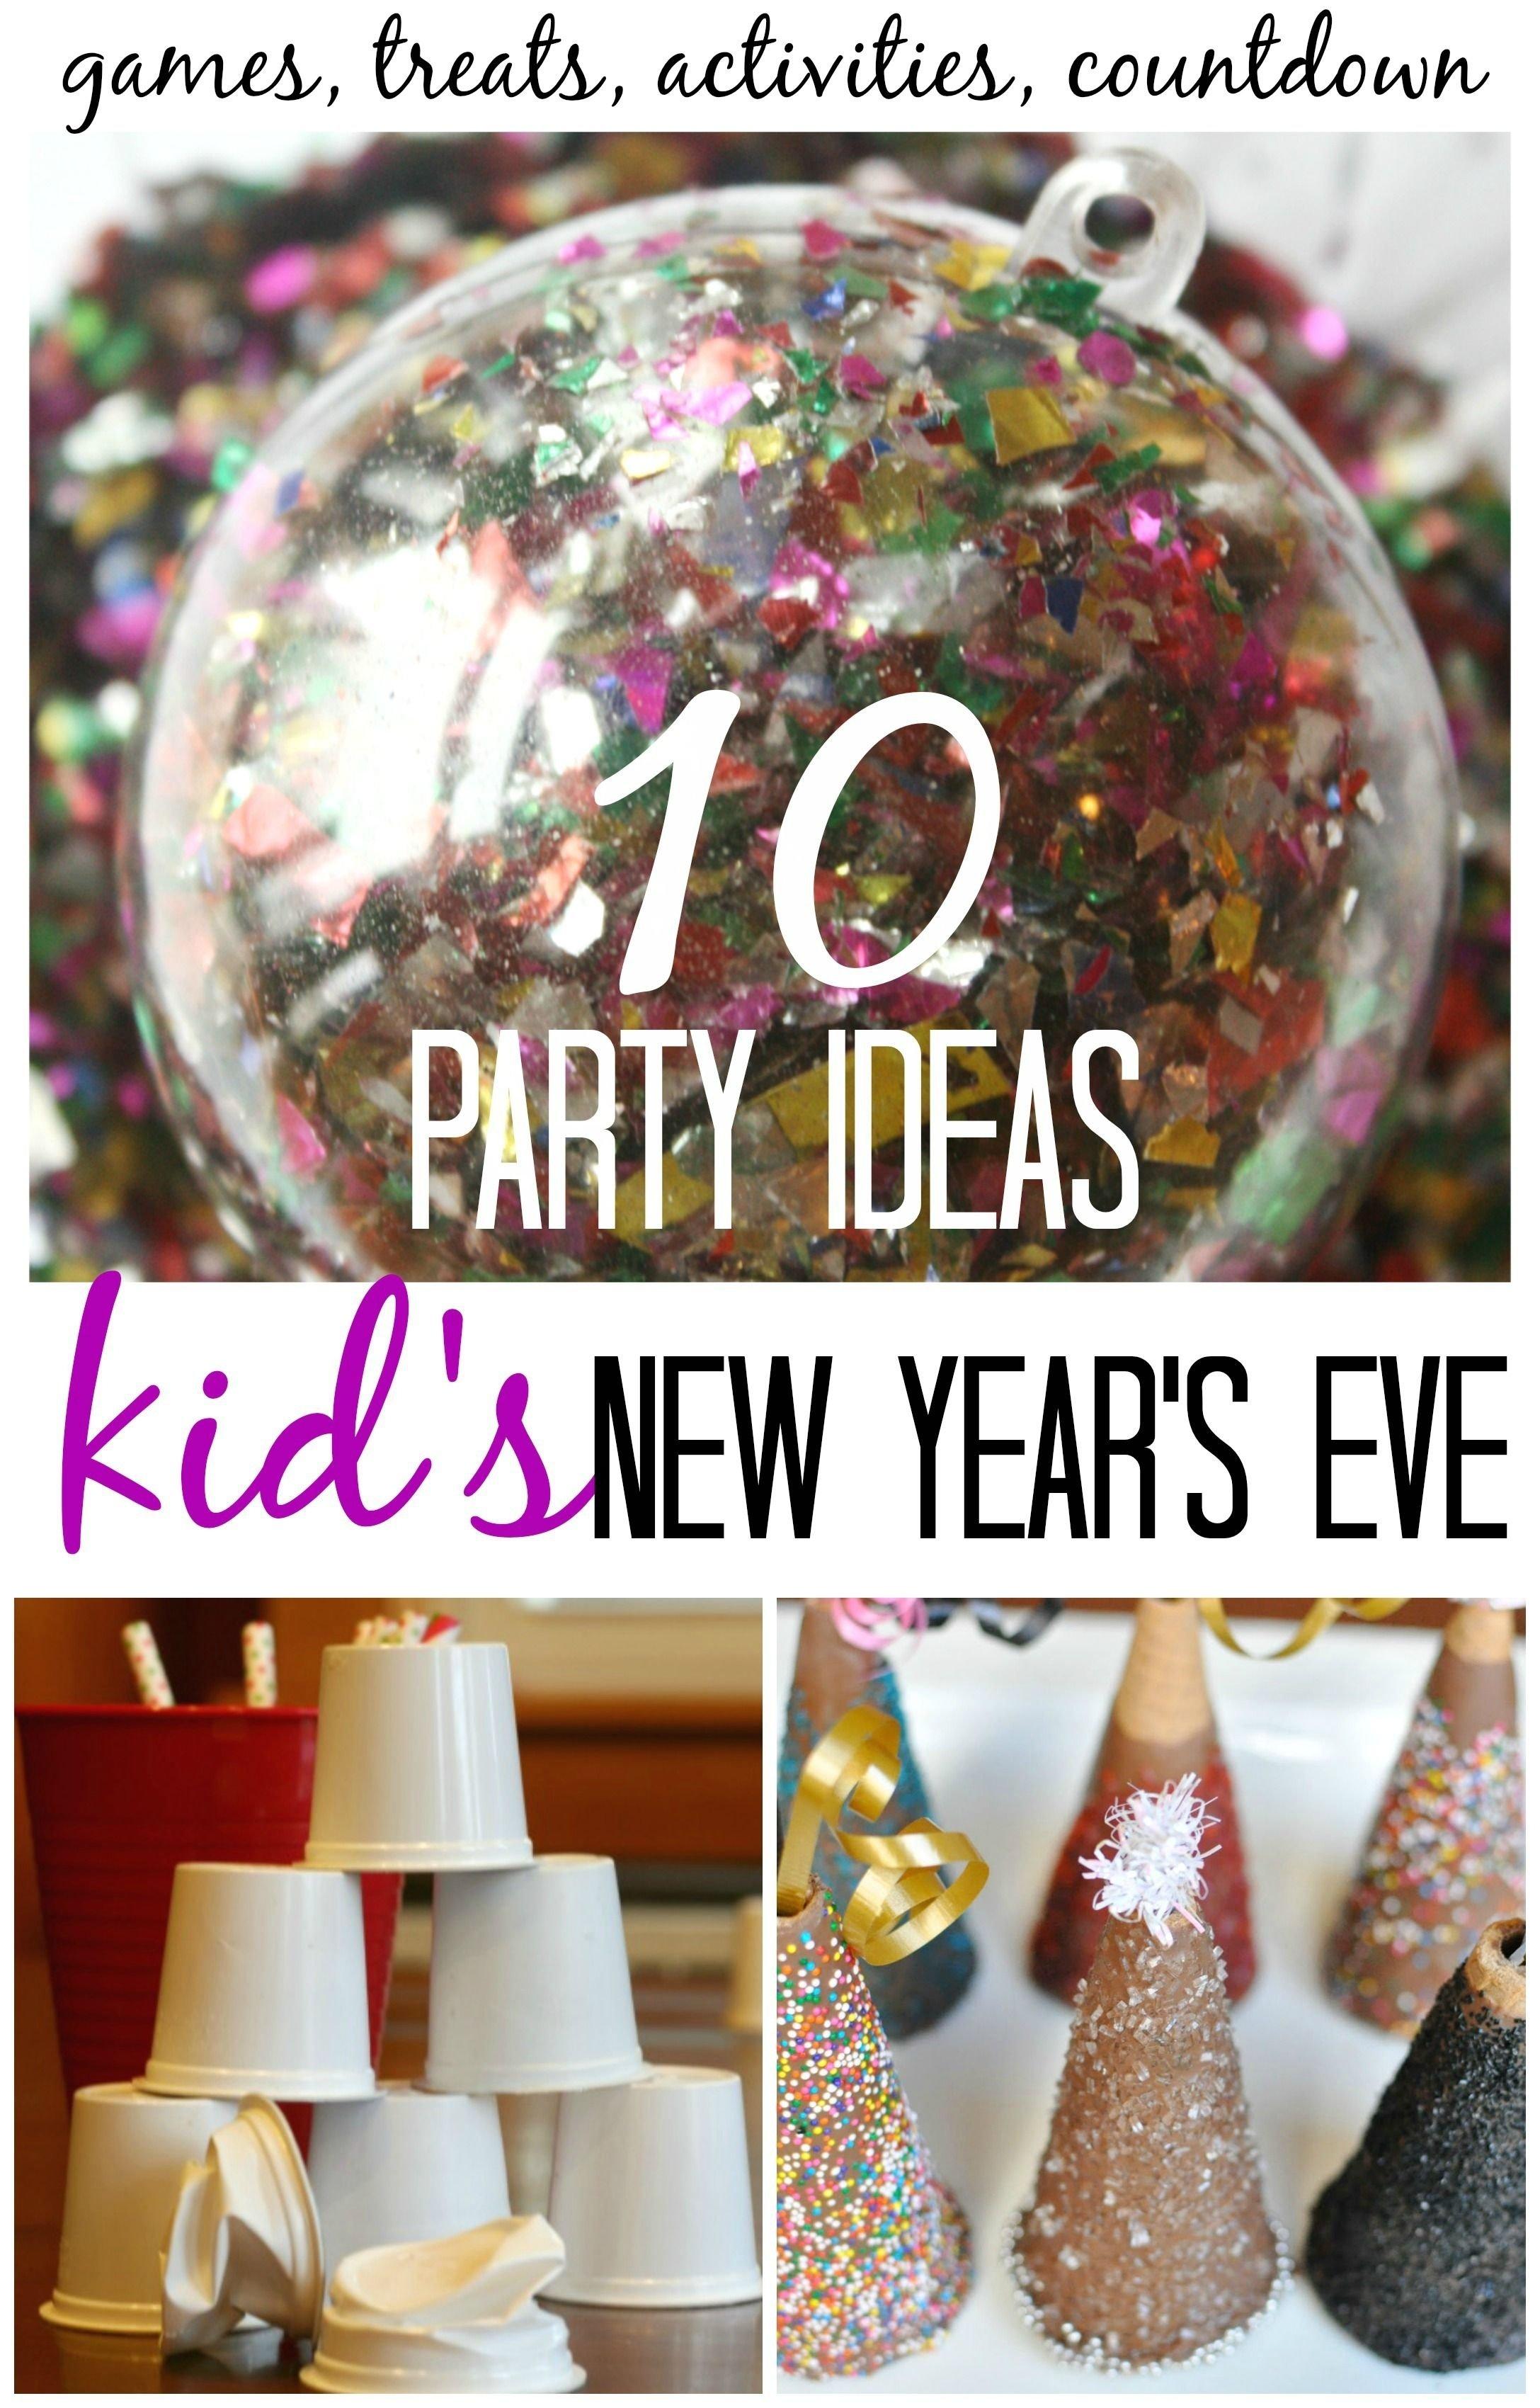 10 Wonderful New Years Eve Game Ideas kids new years eve party ideas and activities for new years 13 2020